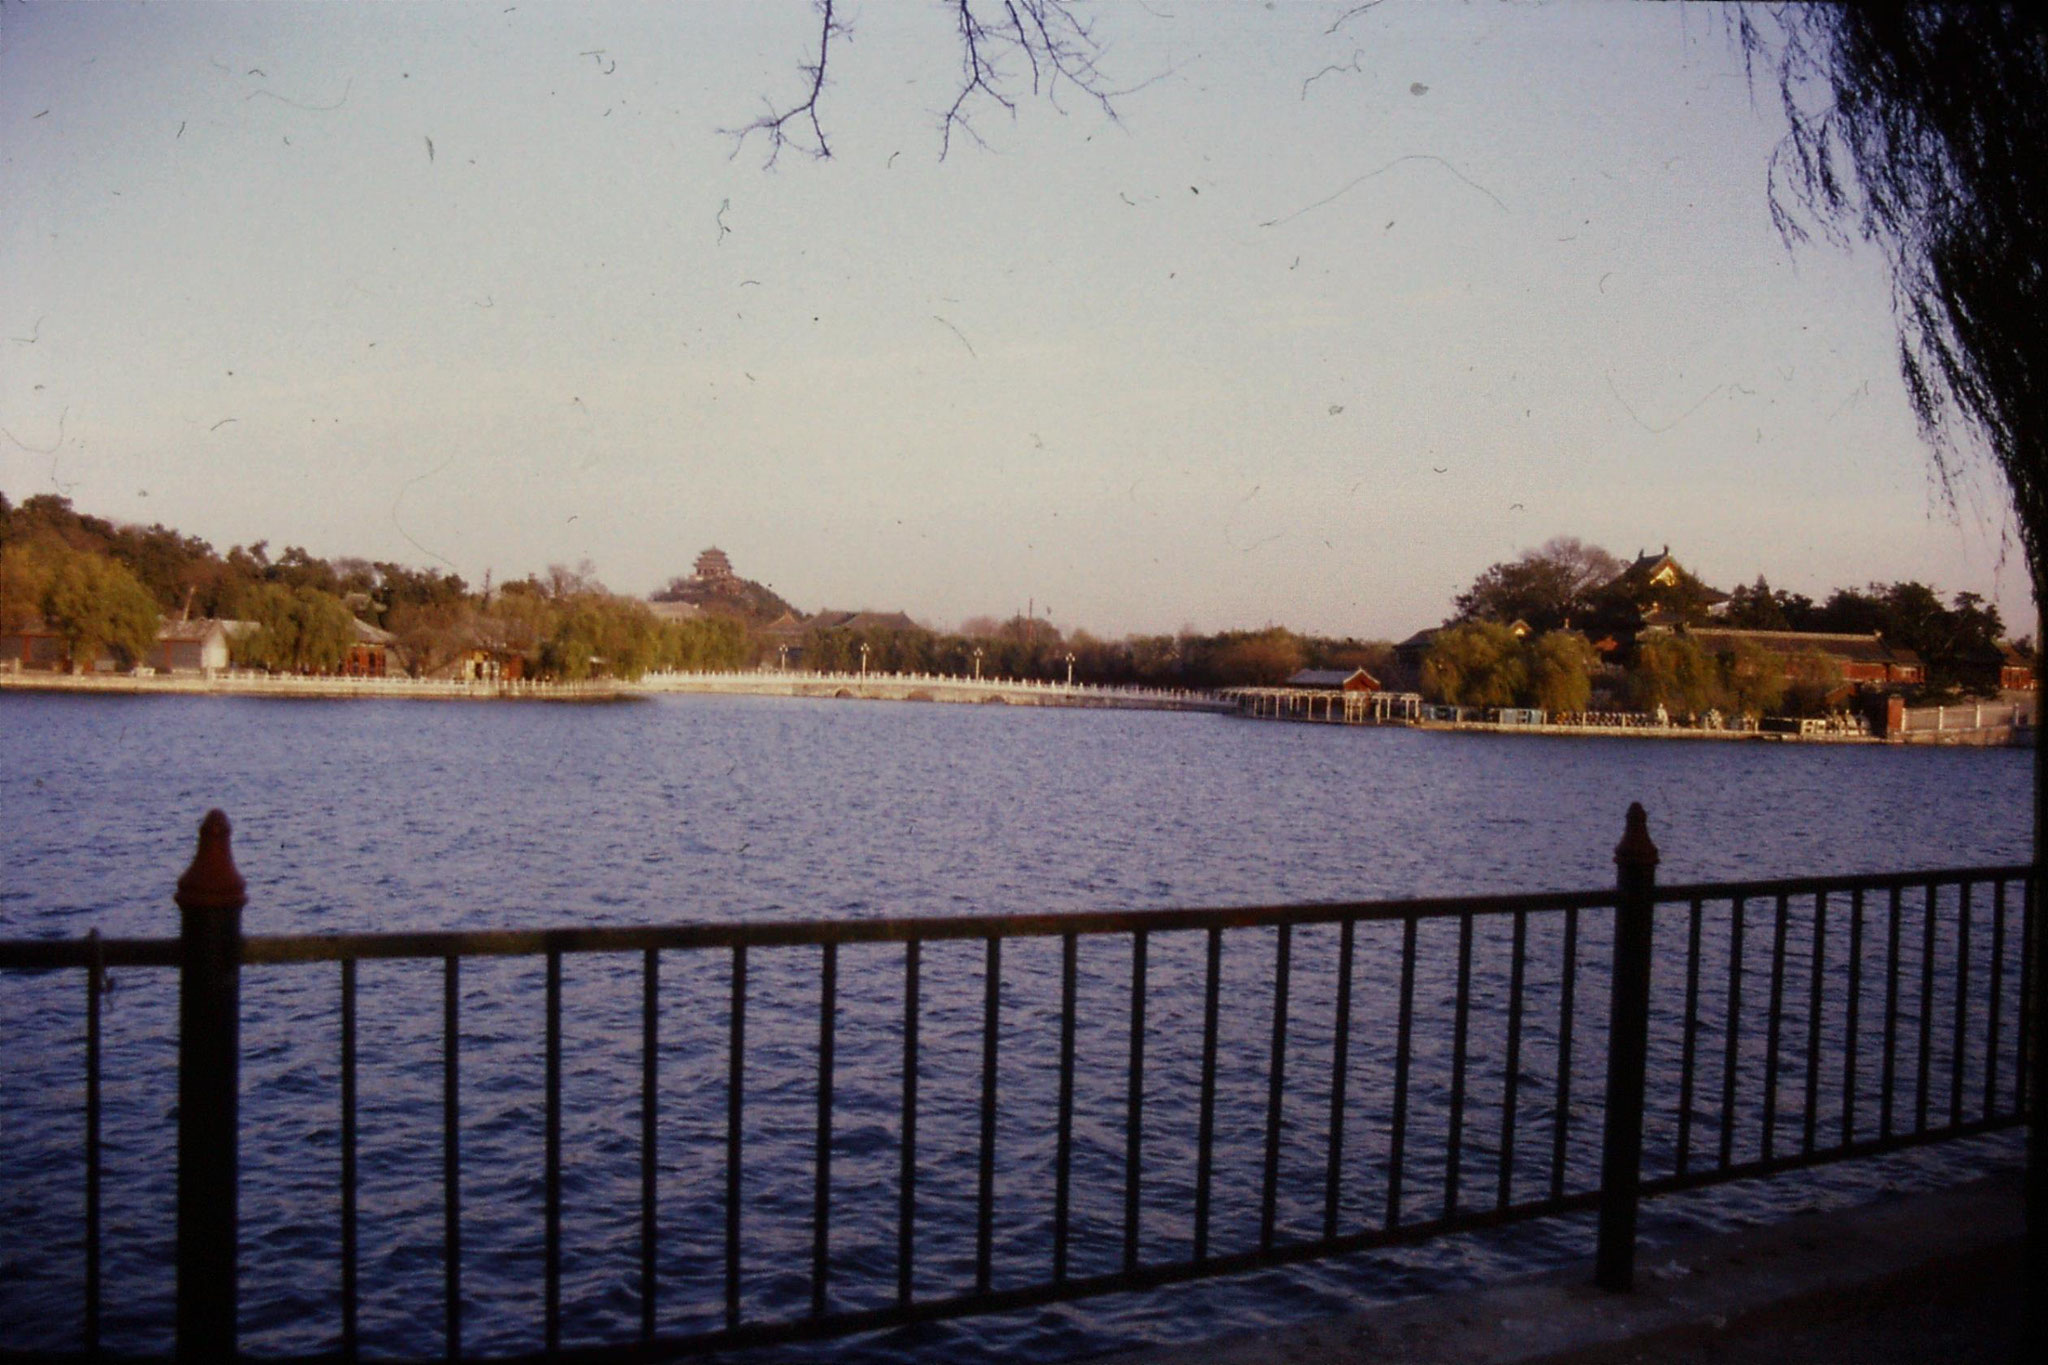 26/11/1988: 7:Beihai Park